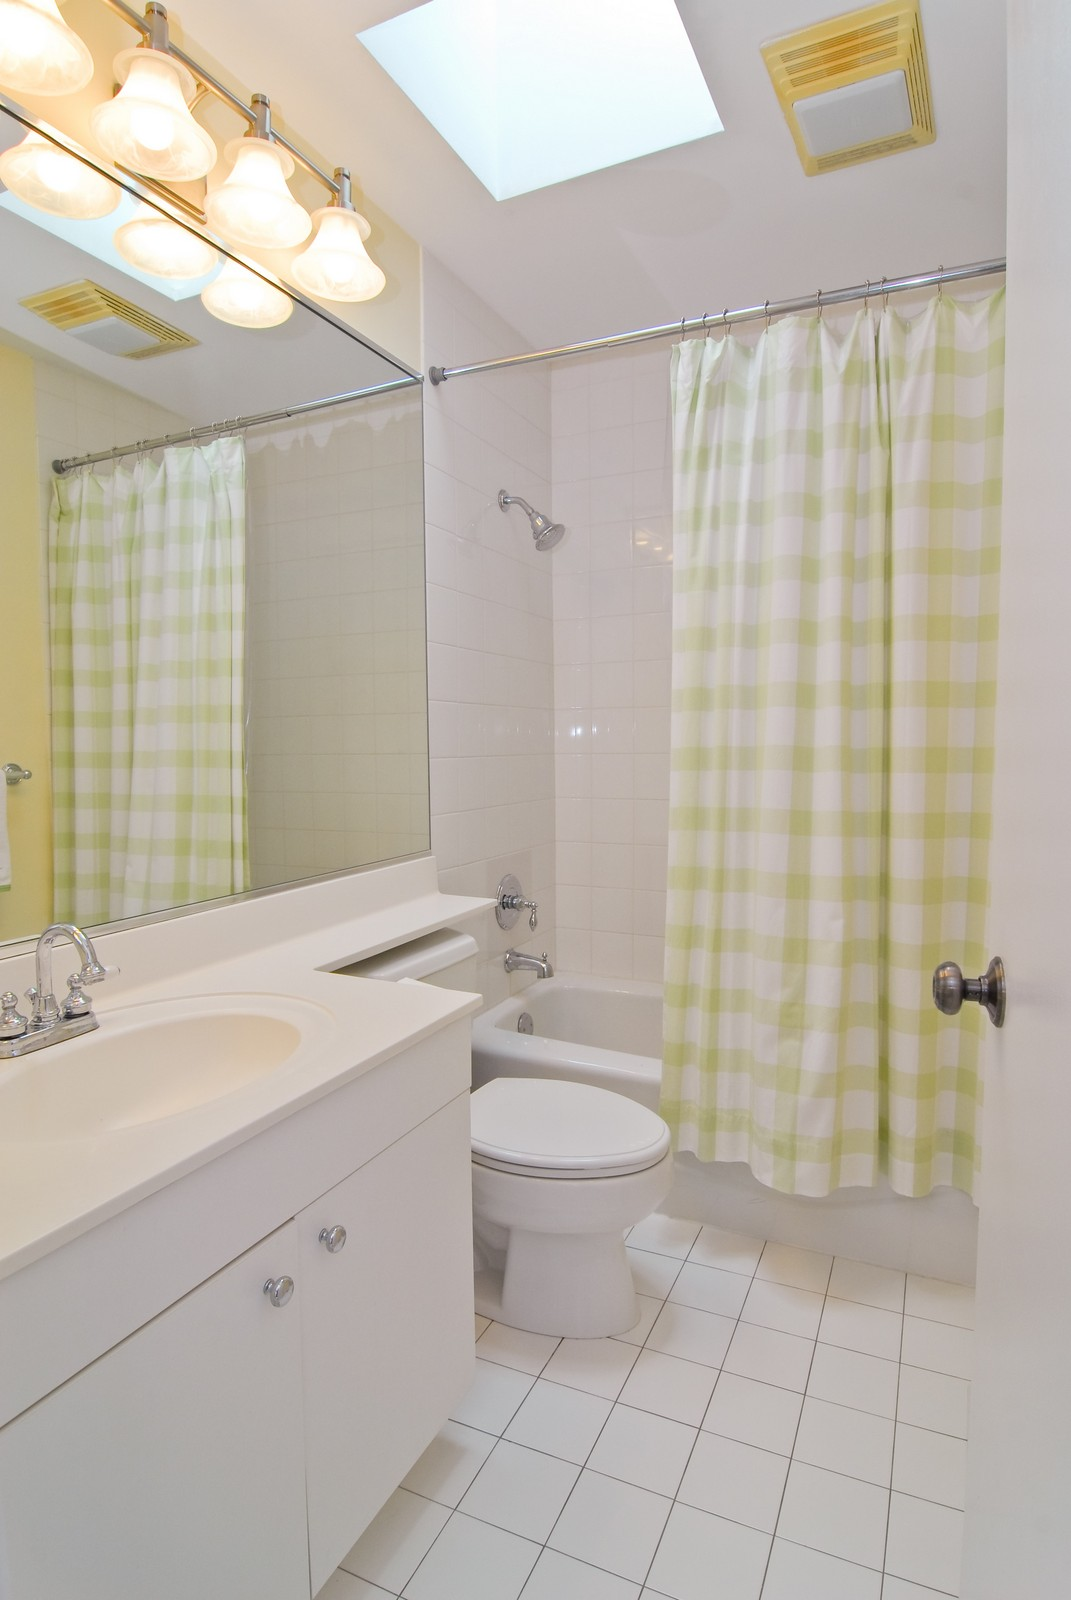 Real Estate Photography - 2501 N Wayne, Unit 17, Chicago, IL, 60614 - Bathroom